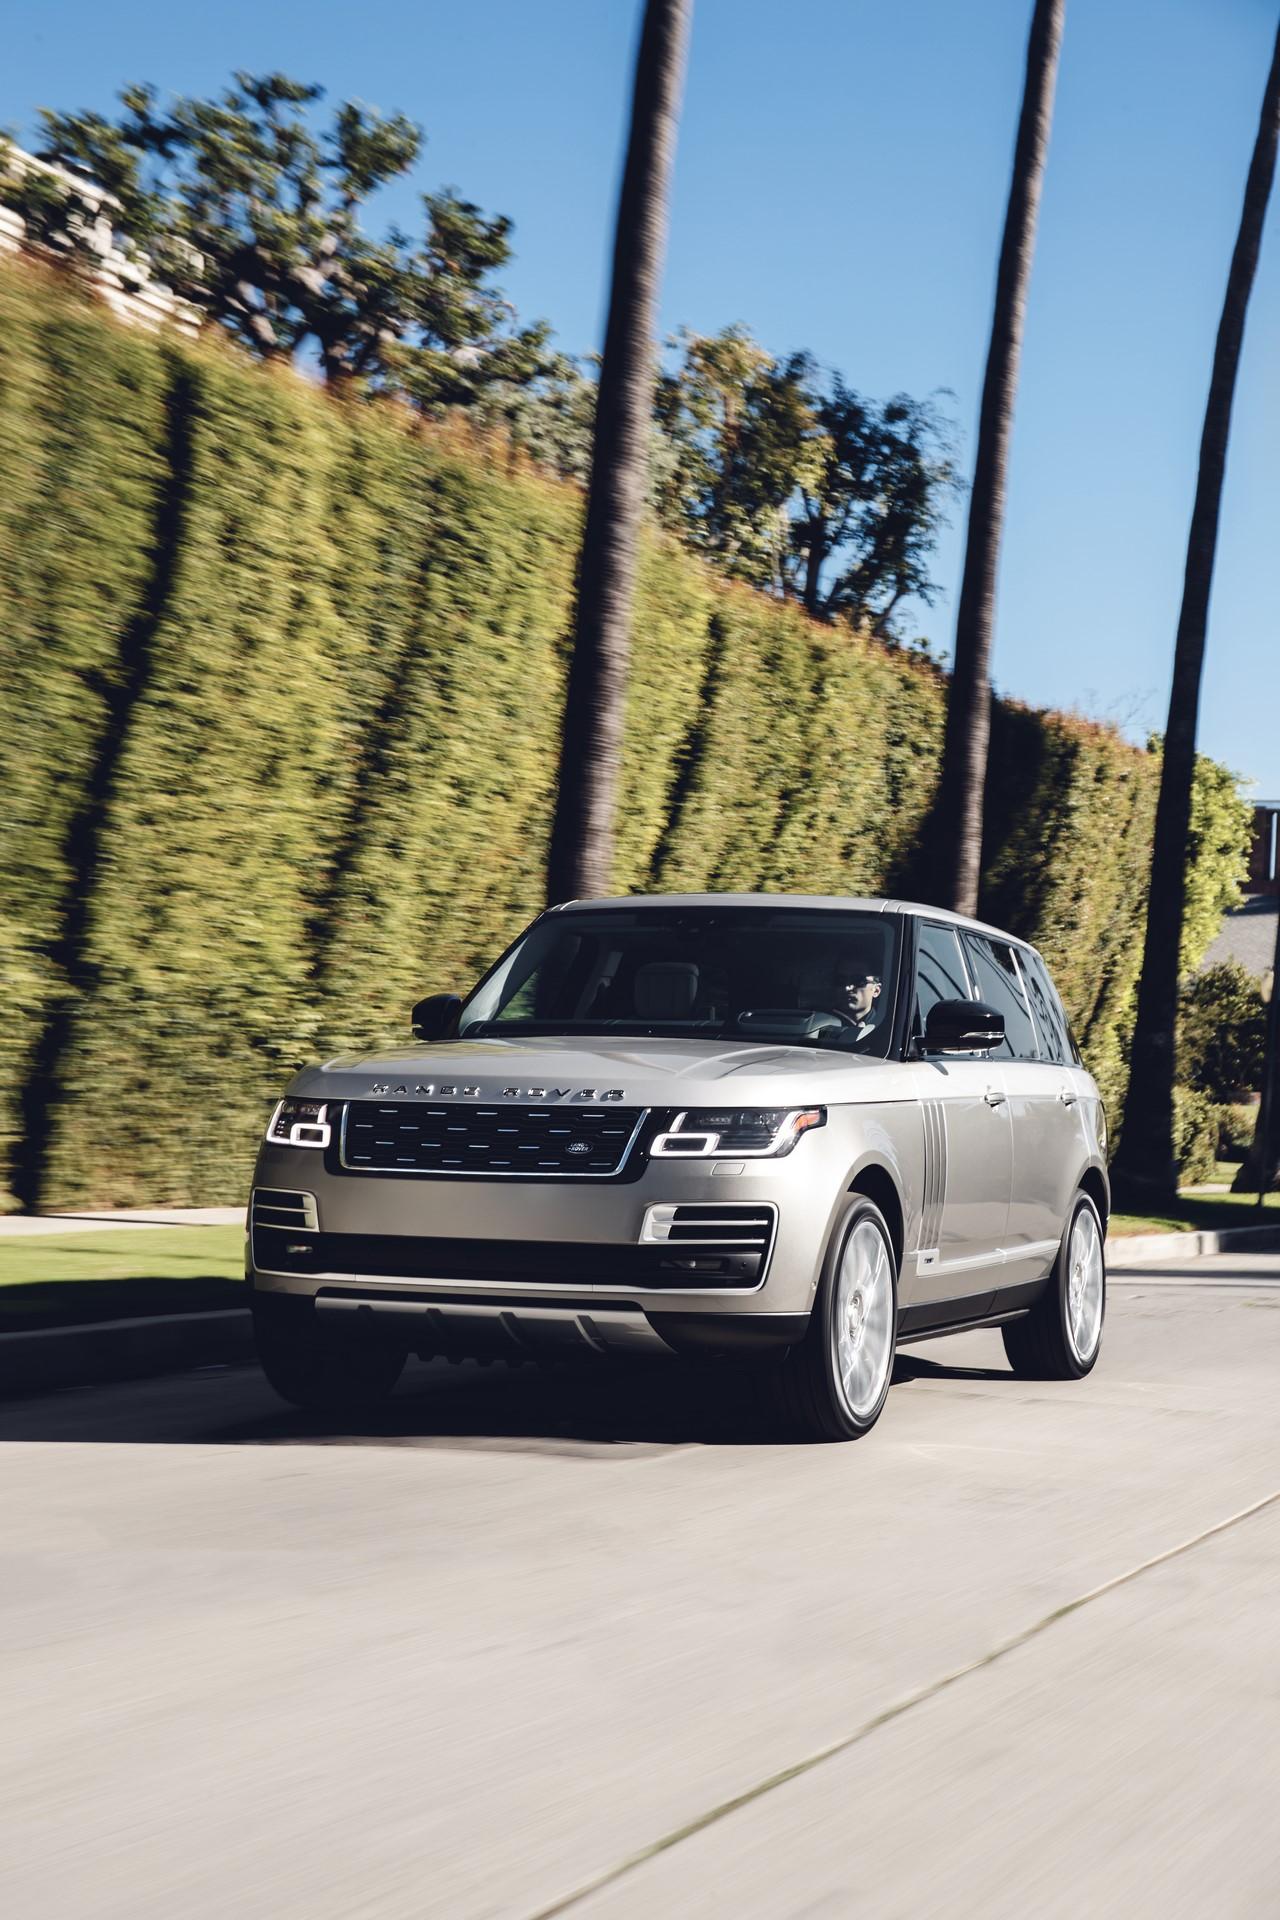 Range Rover SVAutobiography 2018 (15)